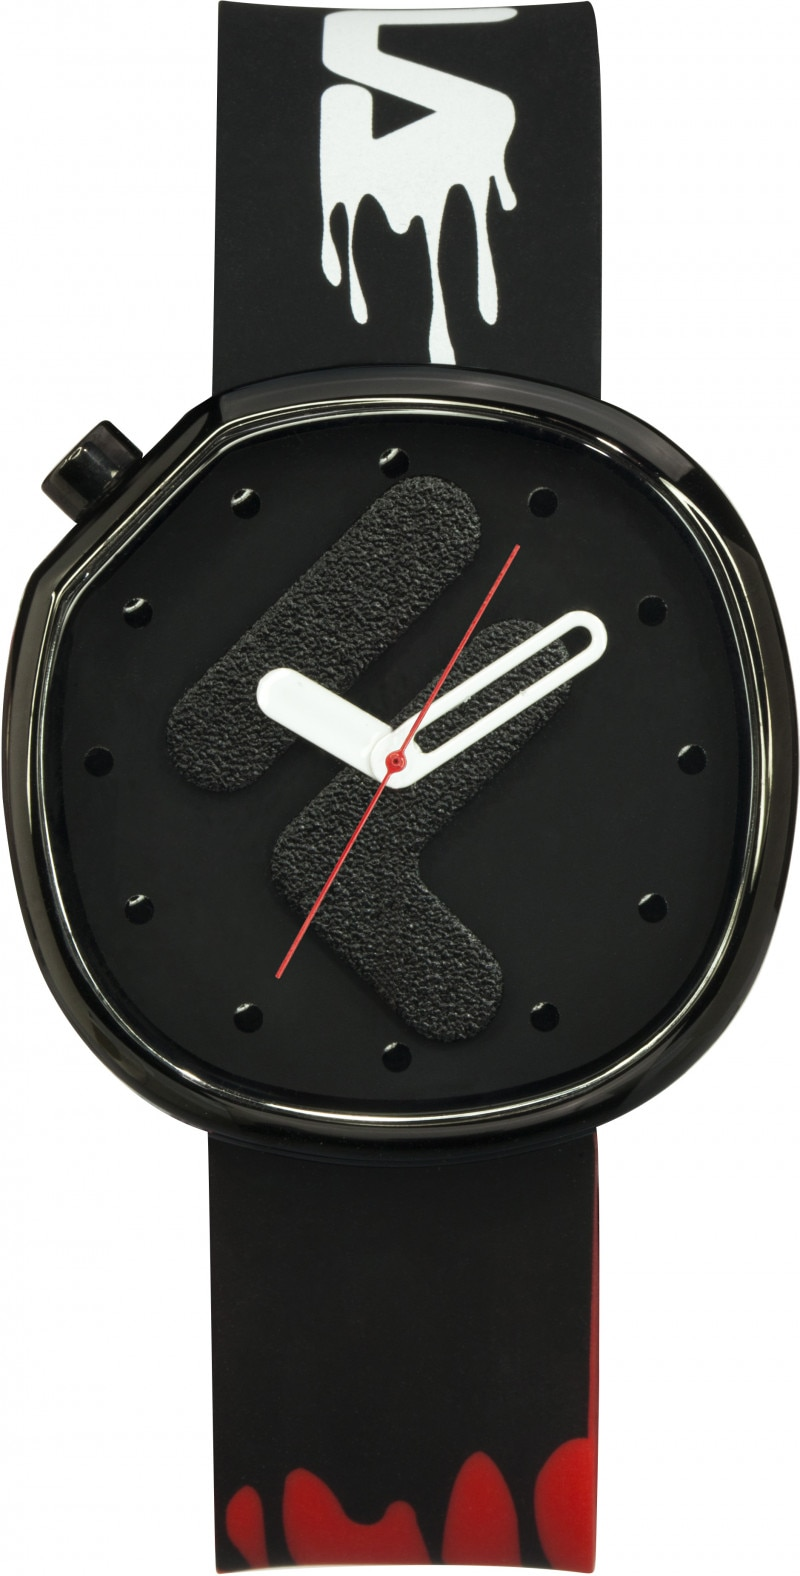 Smart watch row analog watch. 3 Needles. Steel case 40mm. Silicone strap. 3 atm. Gender: unisex